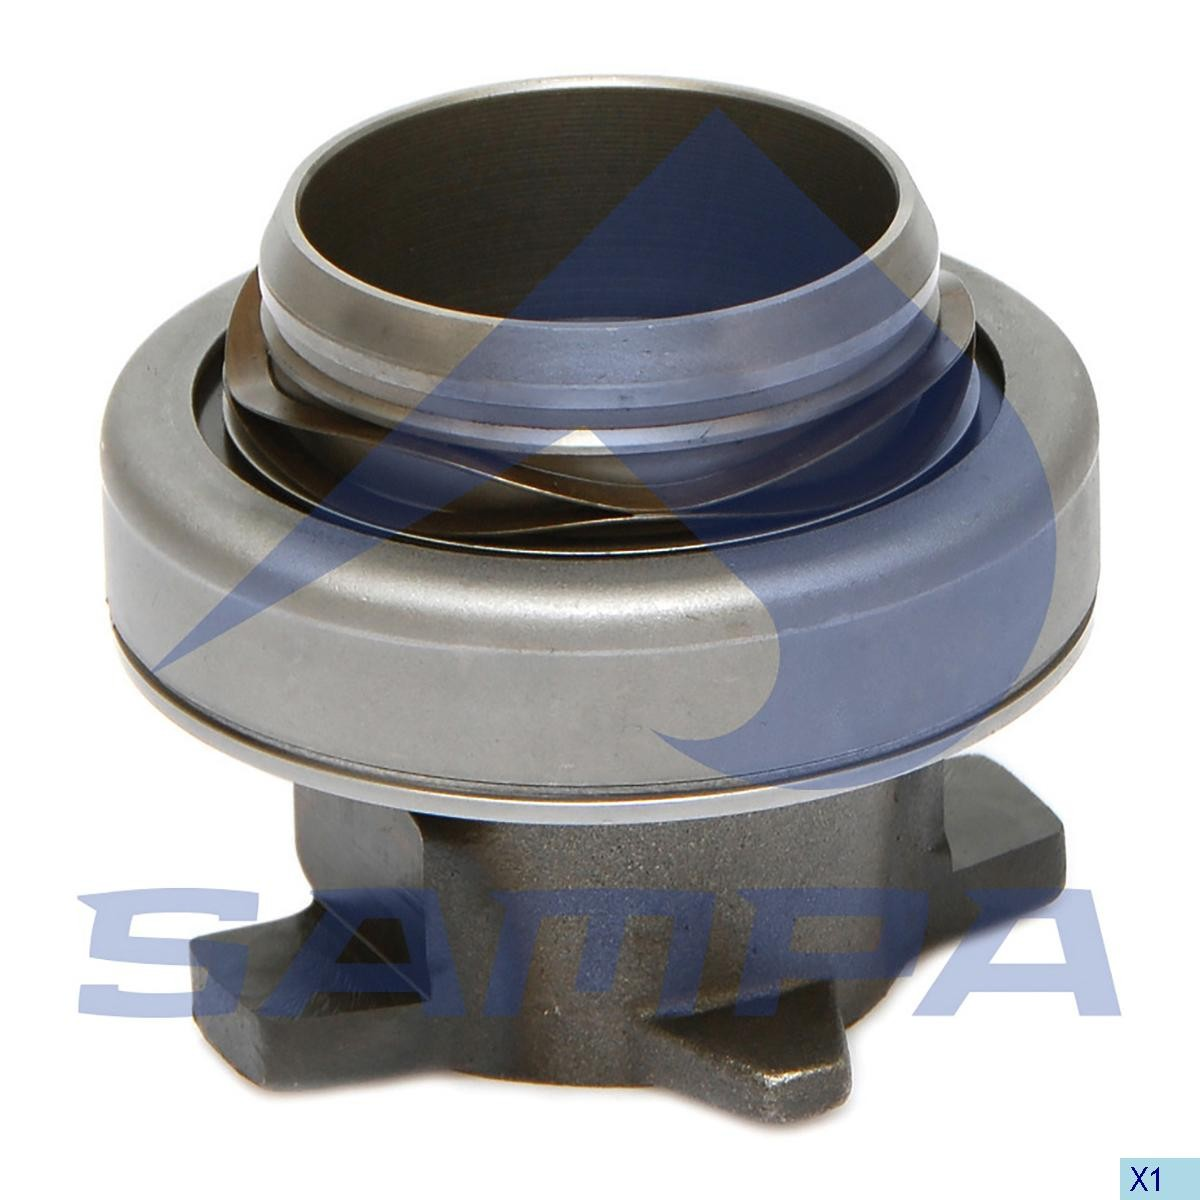 Rulment de presiune ambreiaj DAF 95XF (169001/000034) (Sachs) photo